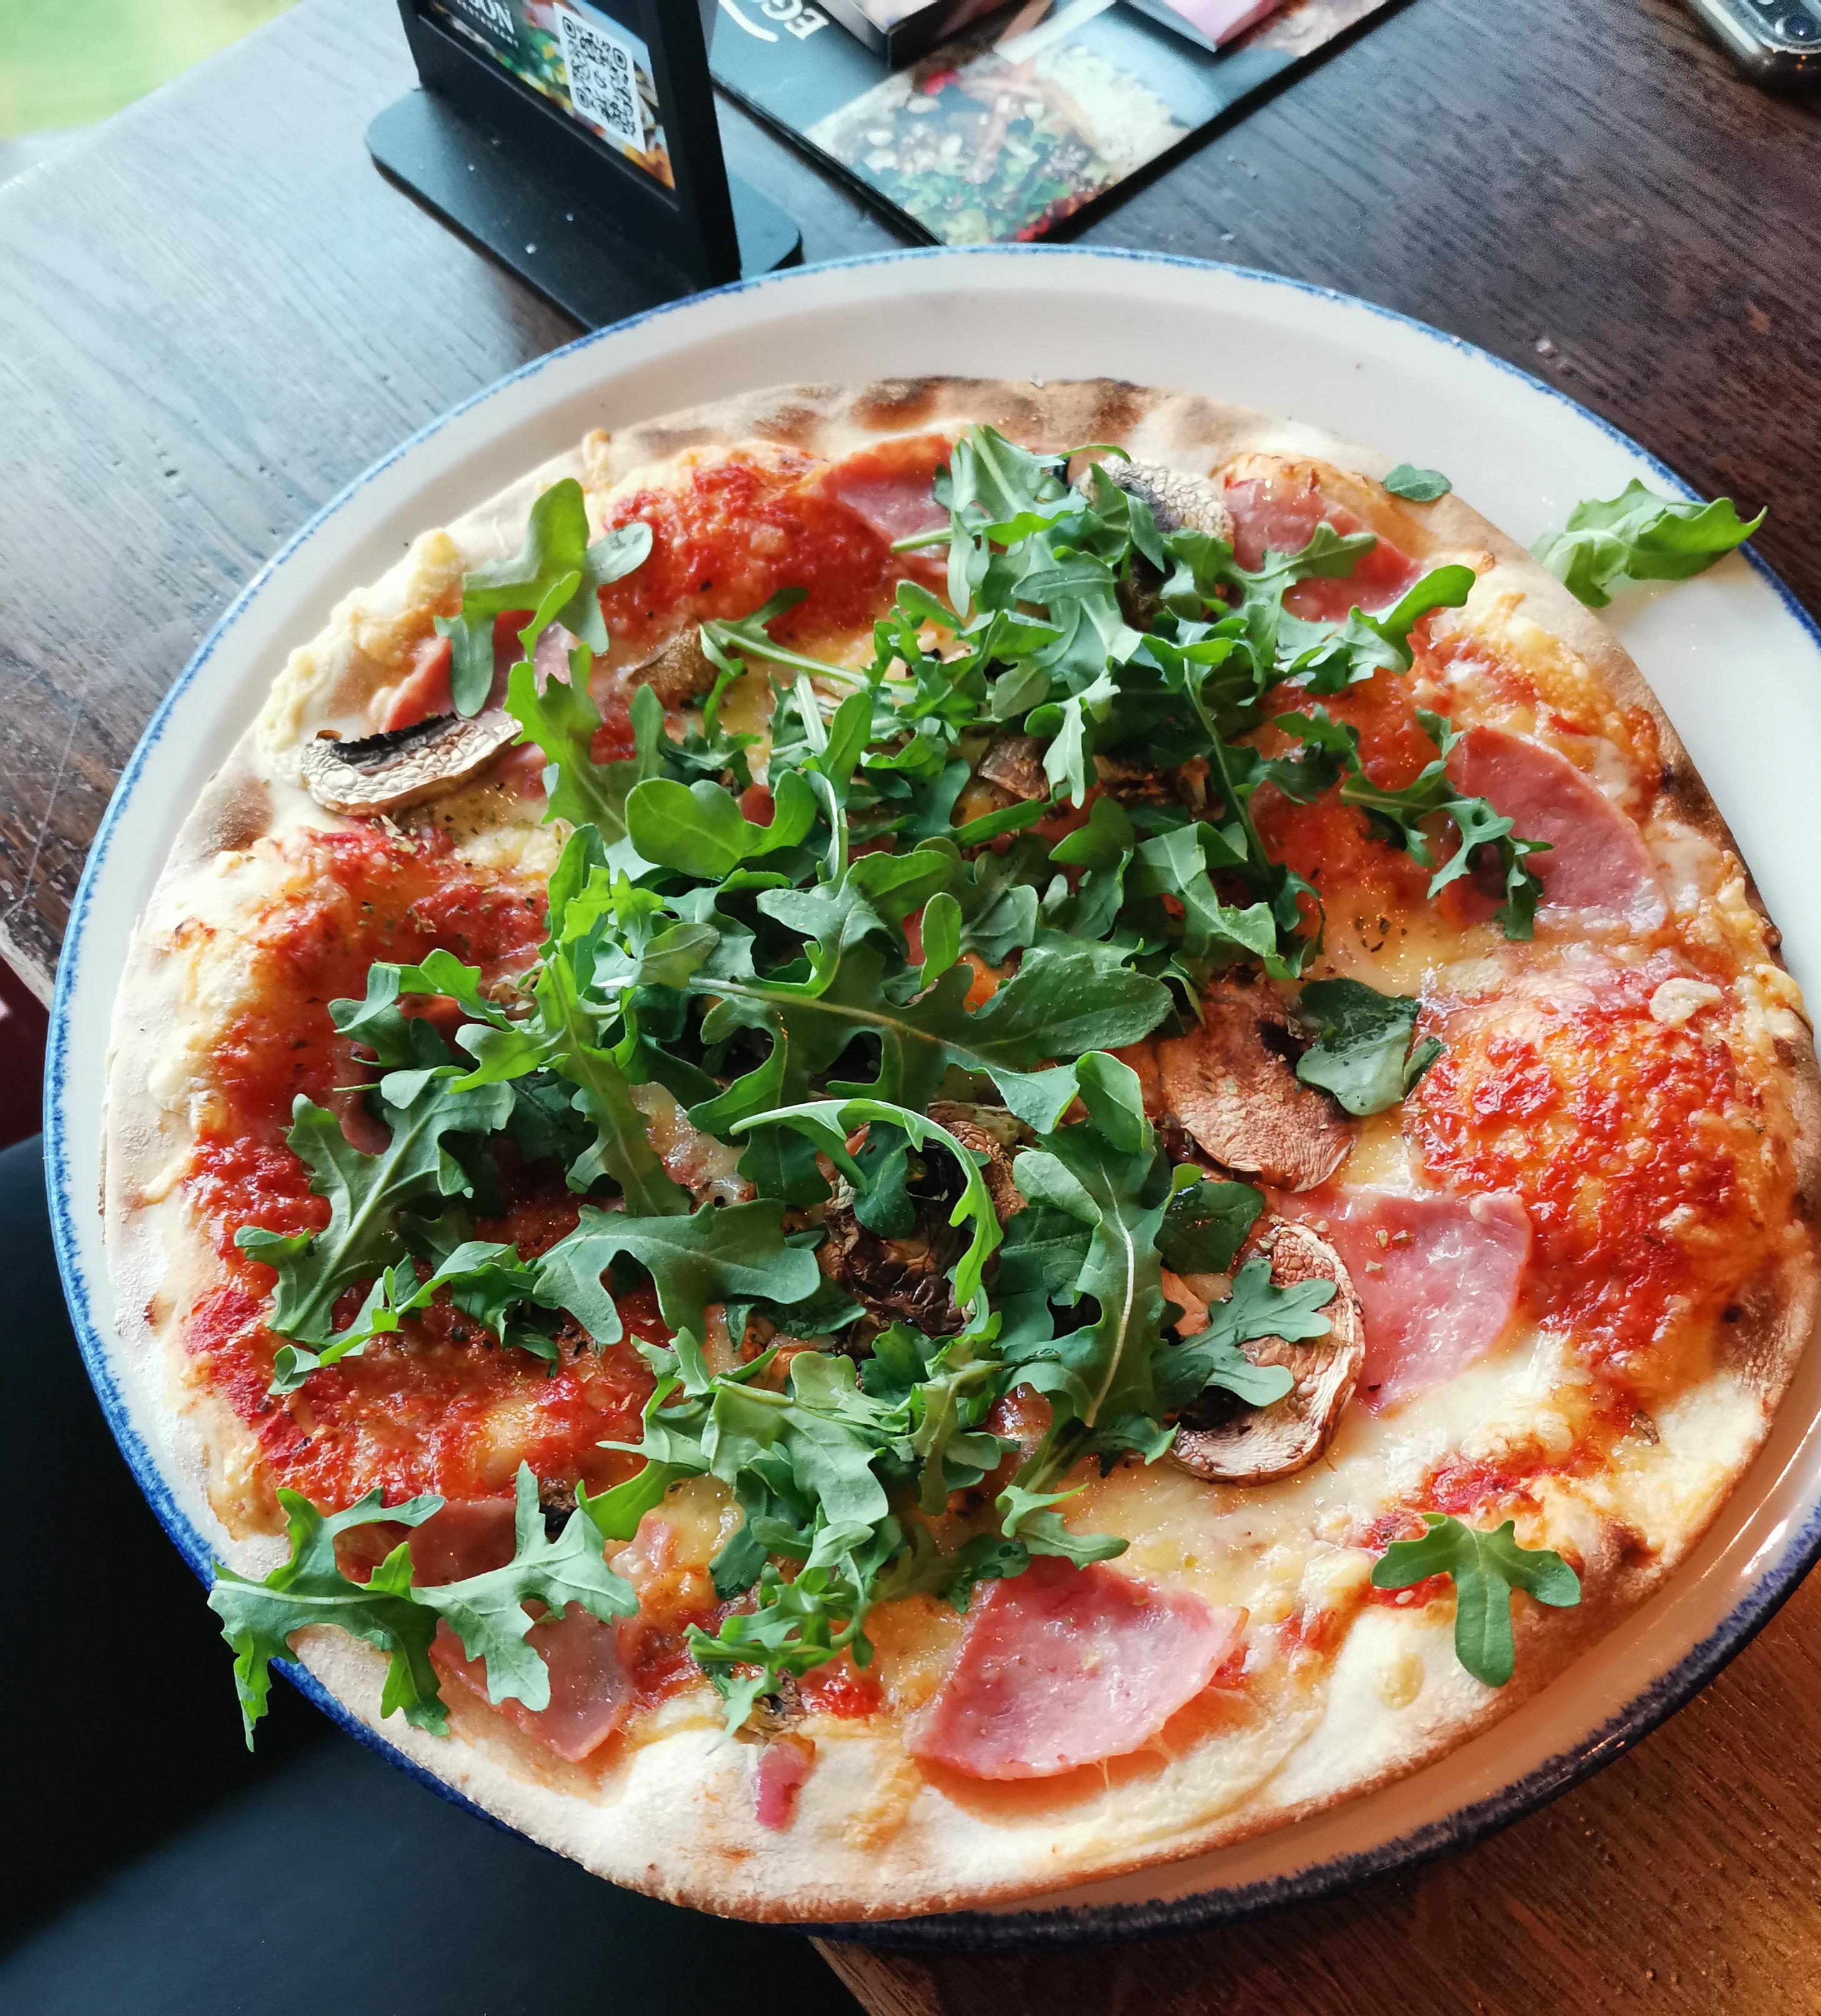 Pizza Prosciutto og sprite Egon i tårnet Otto Nielsens veg 4, 7052 Trondheim https://heidisboble.no/ @heidisboble